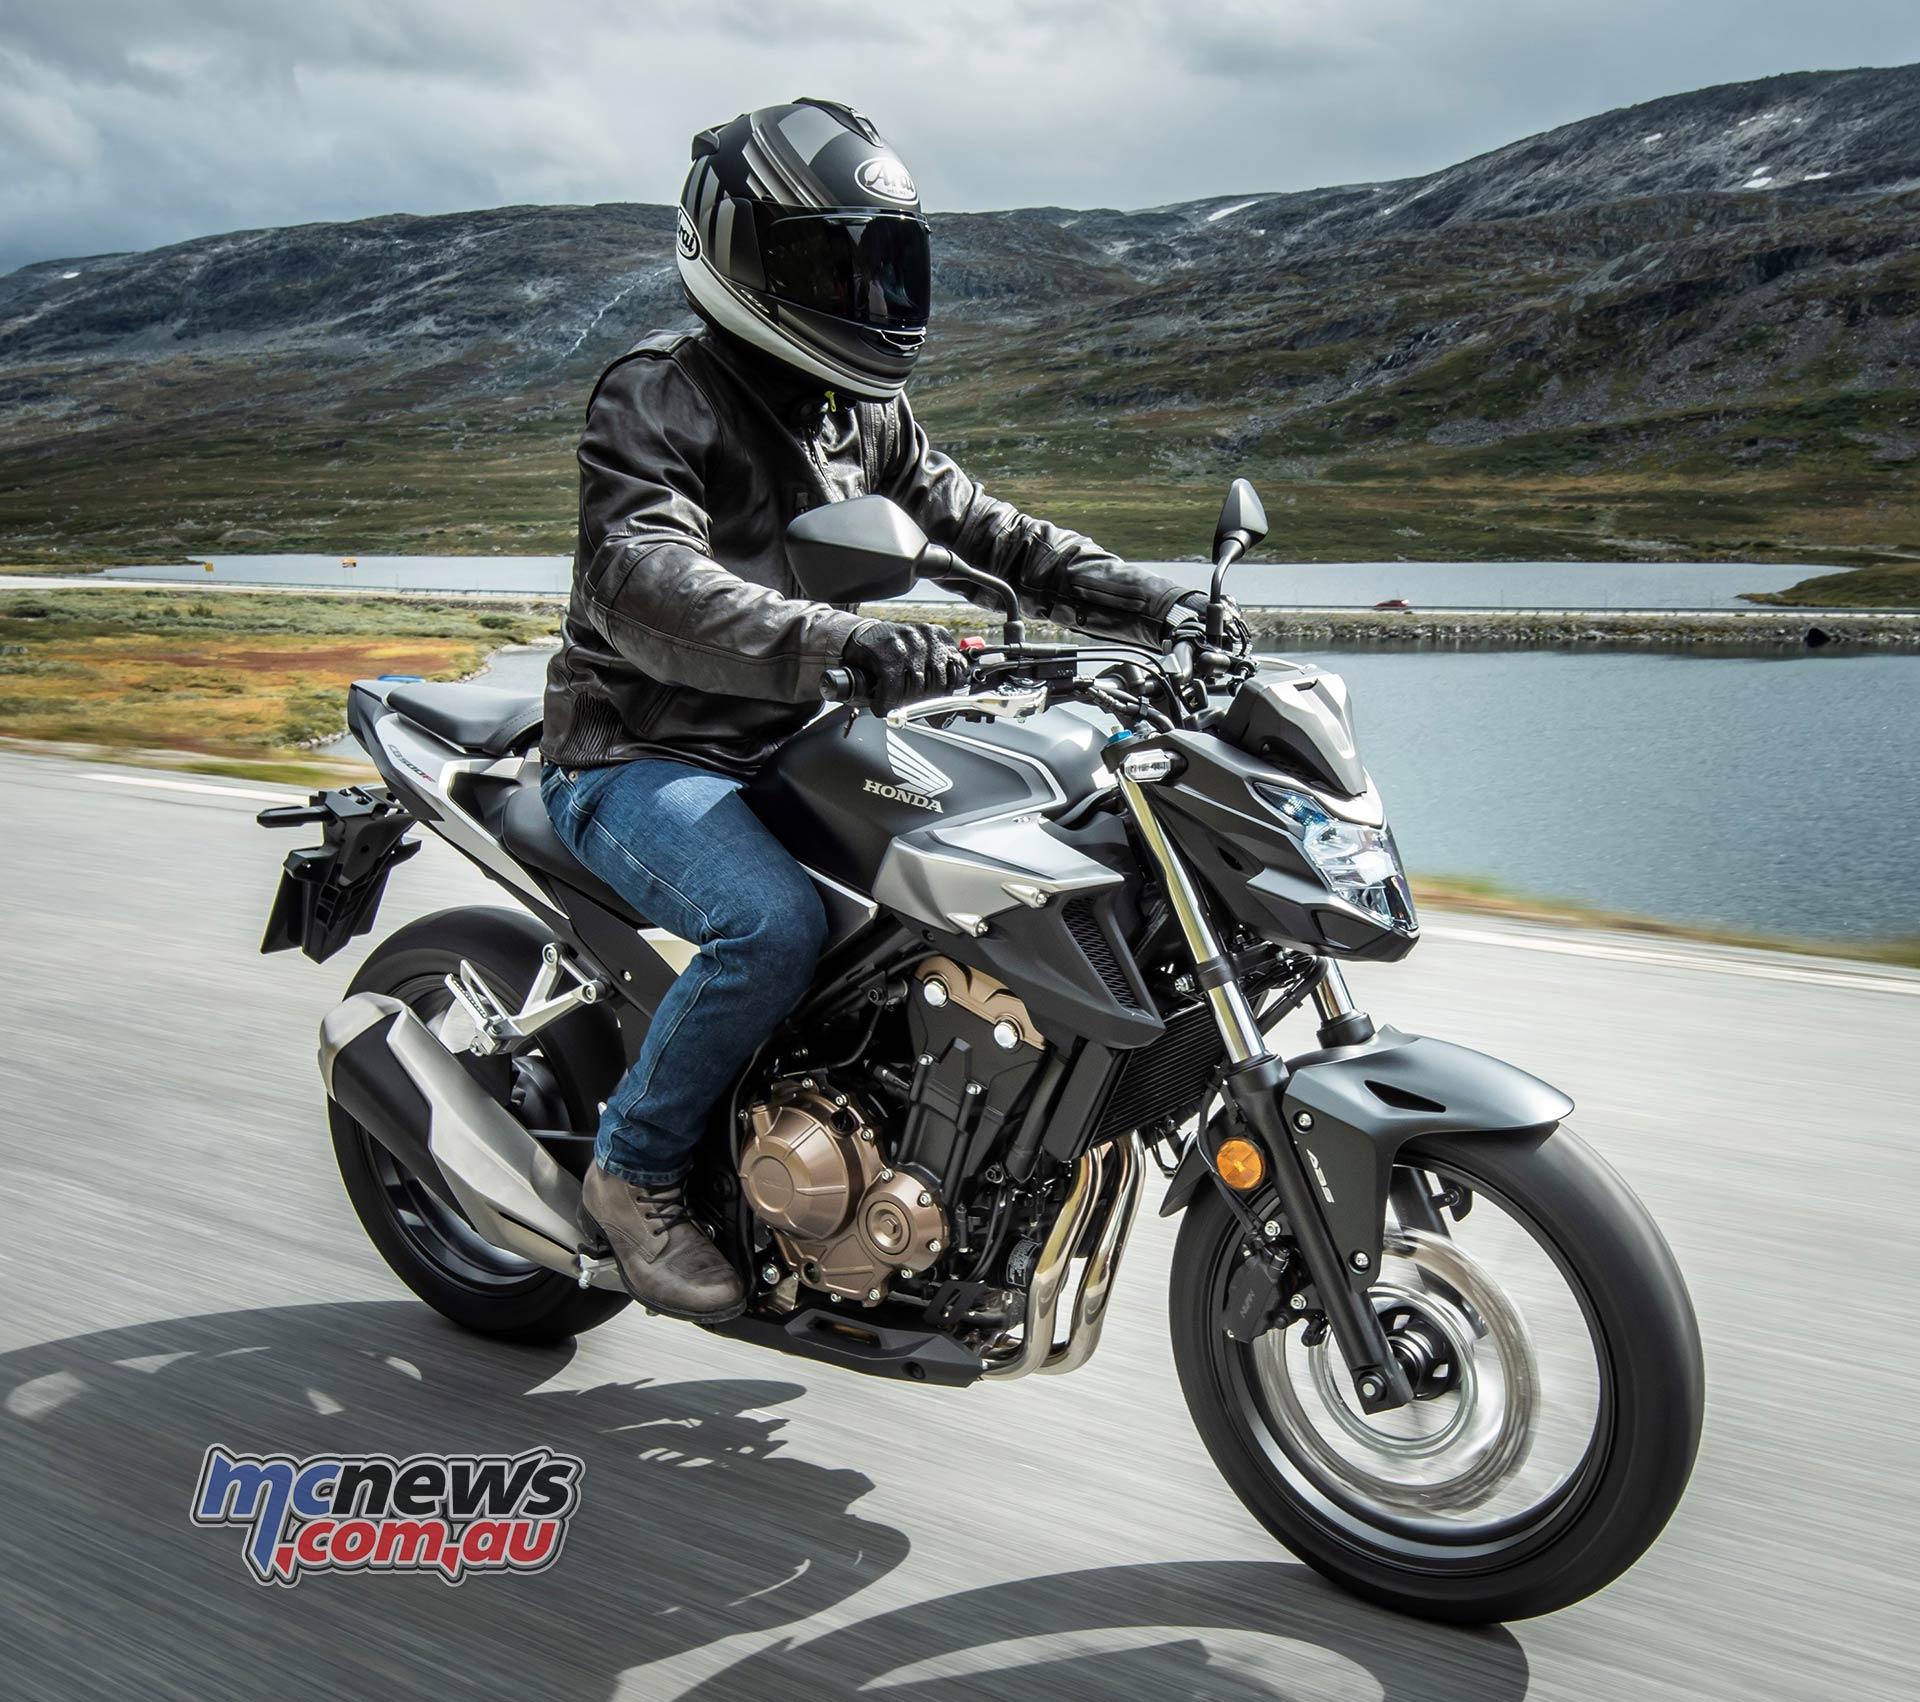 2019: 2019 Honda CB500F Updated